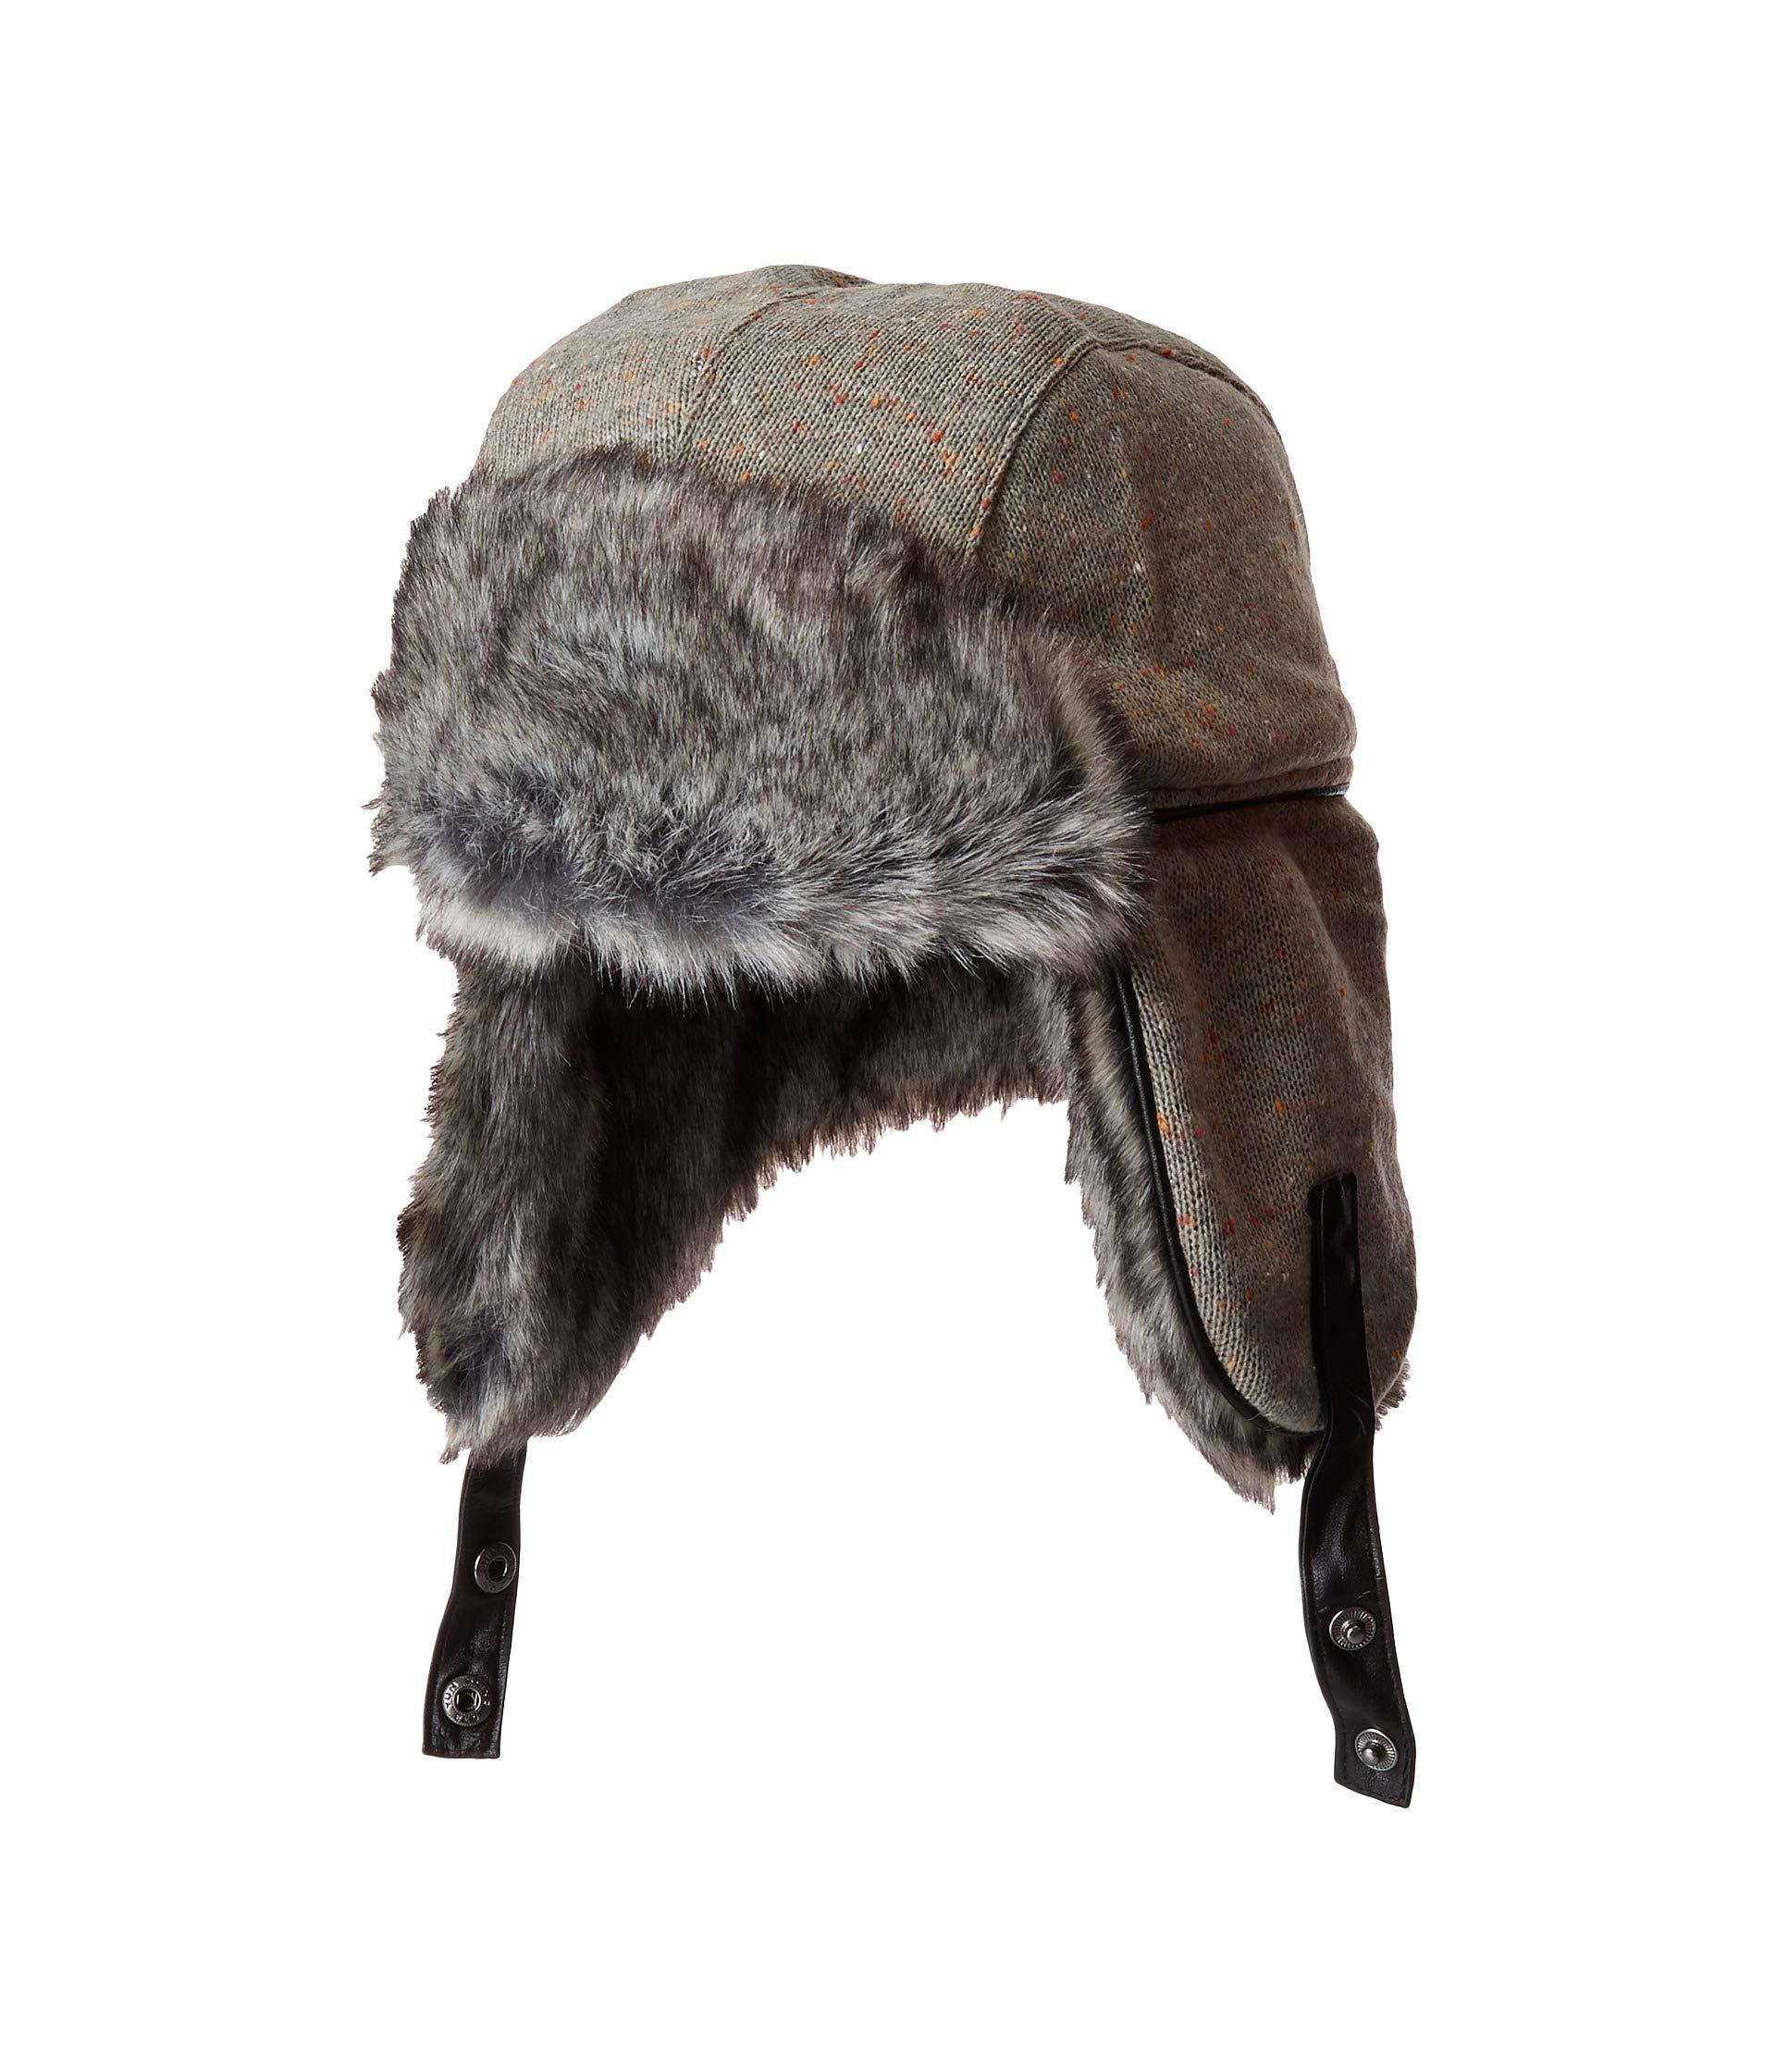 4a73c2d88 Lyst - Obermeyer Trapper Knit Hat W/ Faux Fur (grey Matter) Caps in ...